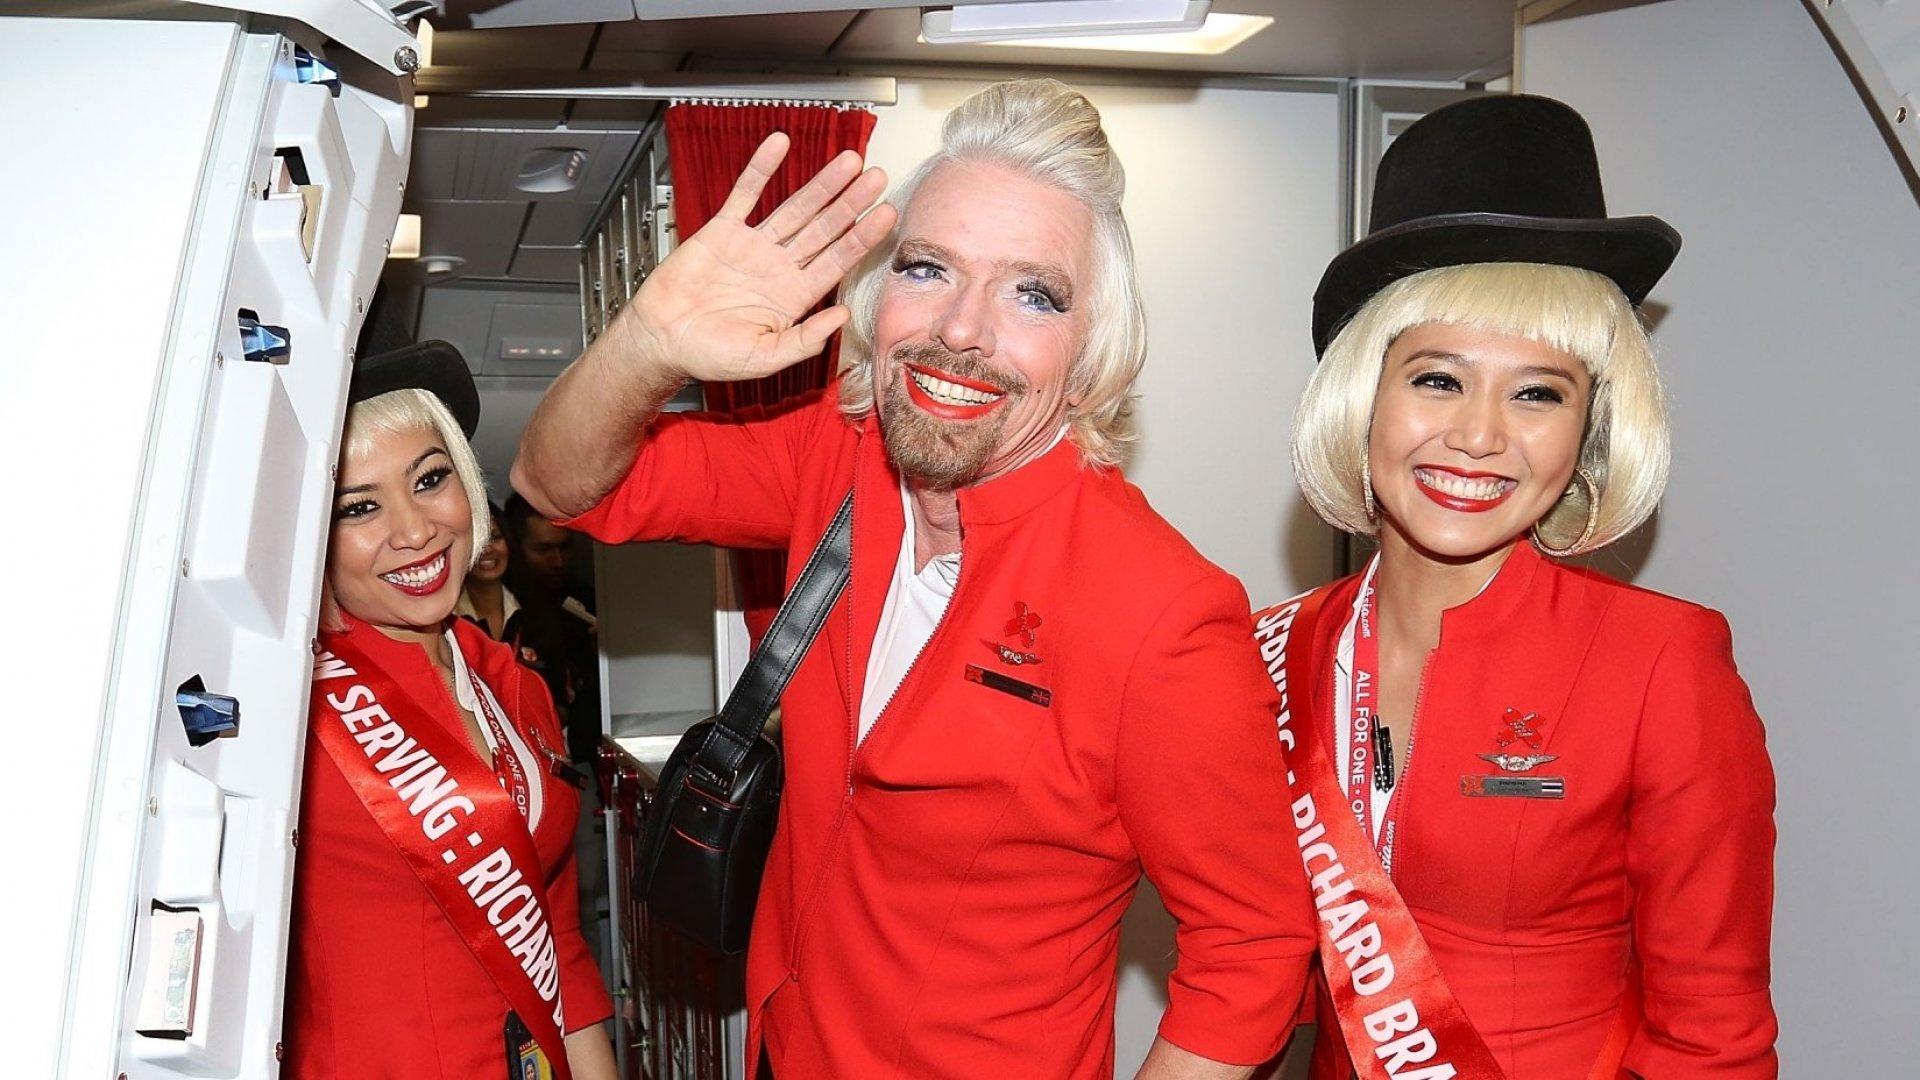 Sir Richard Branson's Advice to Entrepreneurs: Screw It, Just Do It